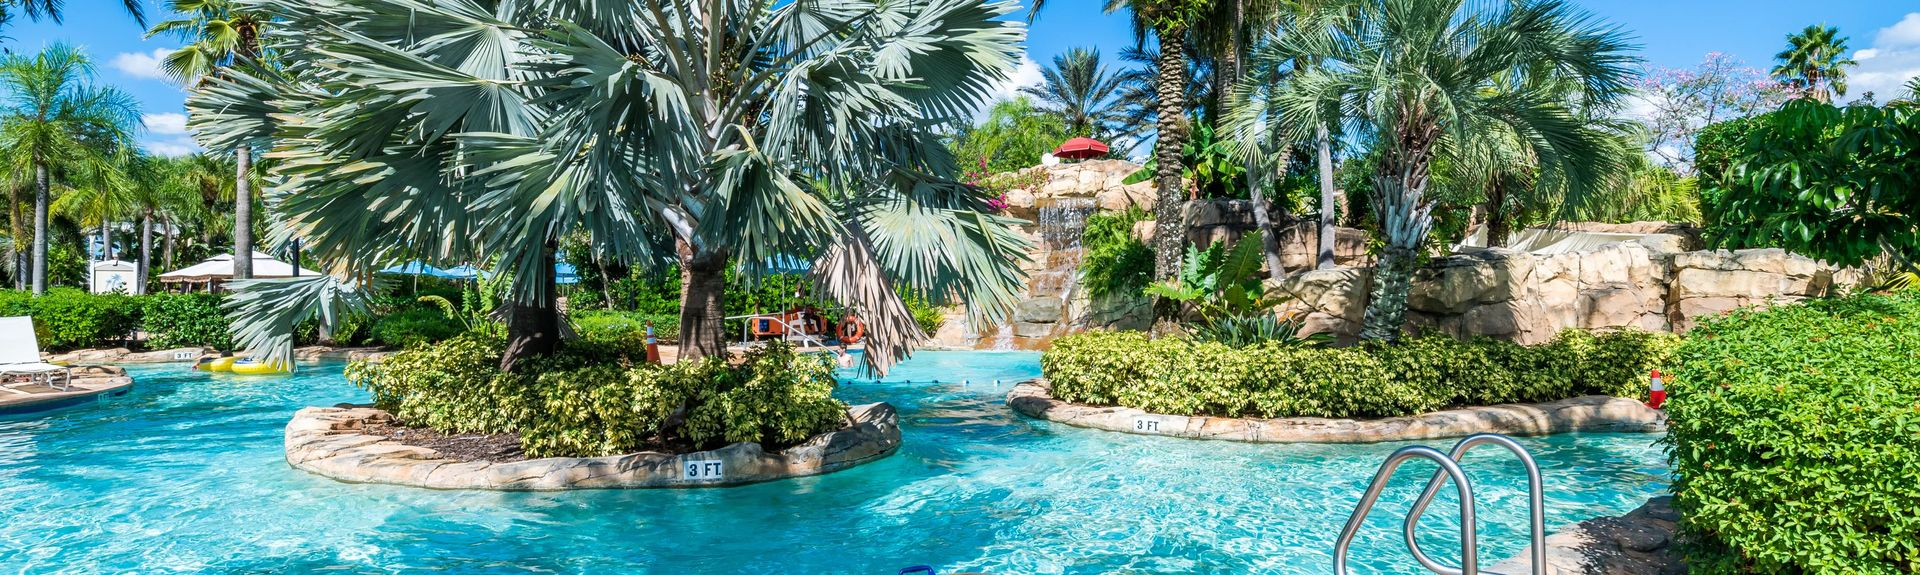 Homestead (Ρεϊνιόν, Φλόριντα, Ηνωμένες Πολιτείες)